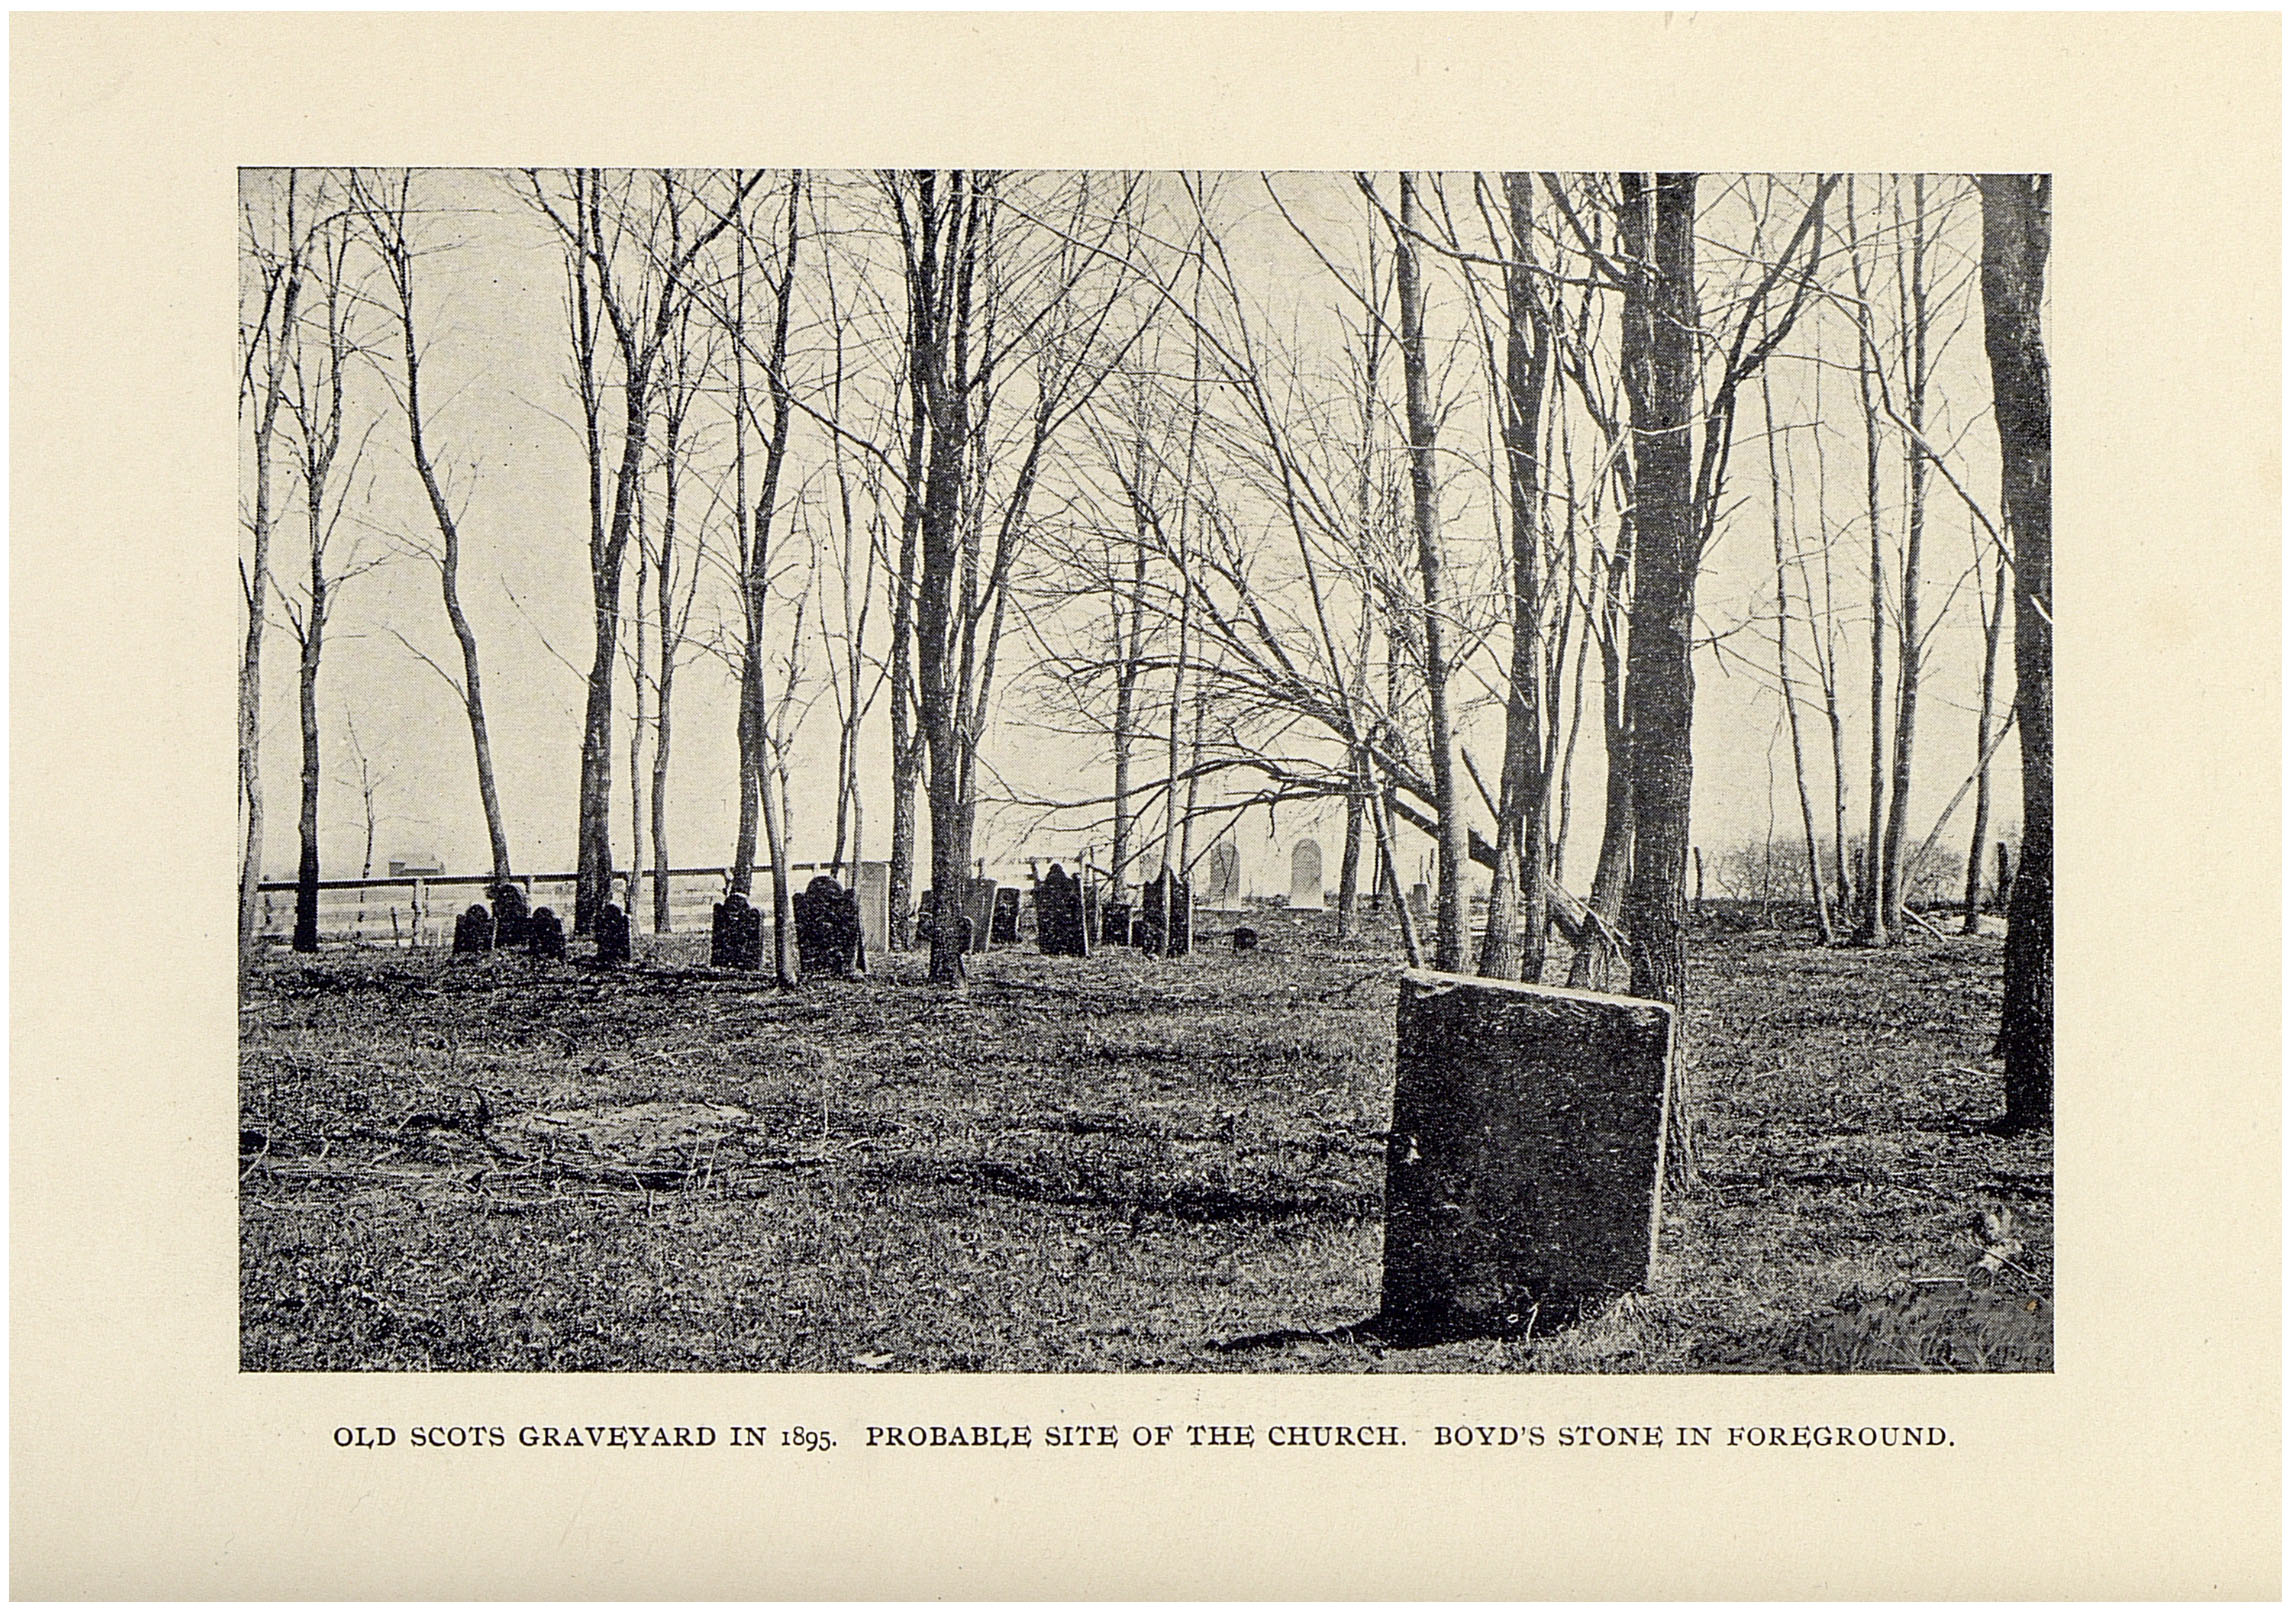 Boyd, John graveyard photo.jpg